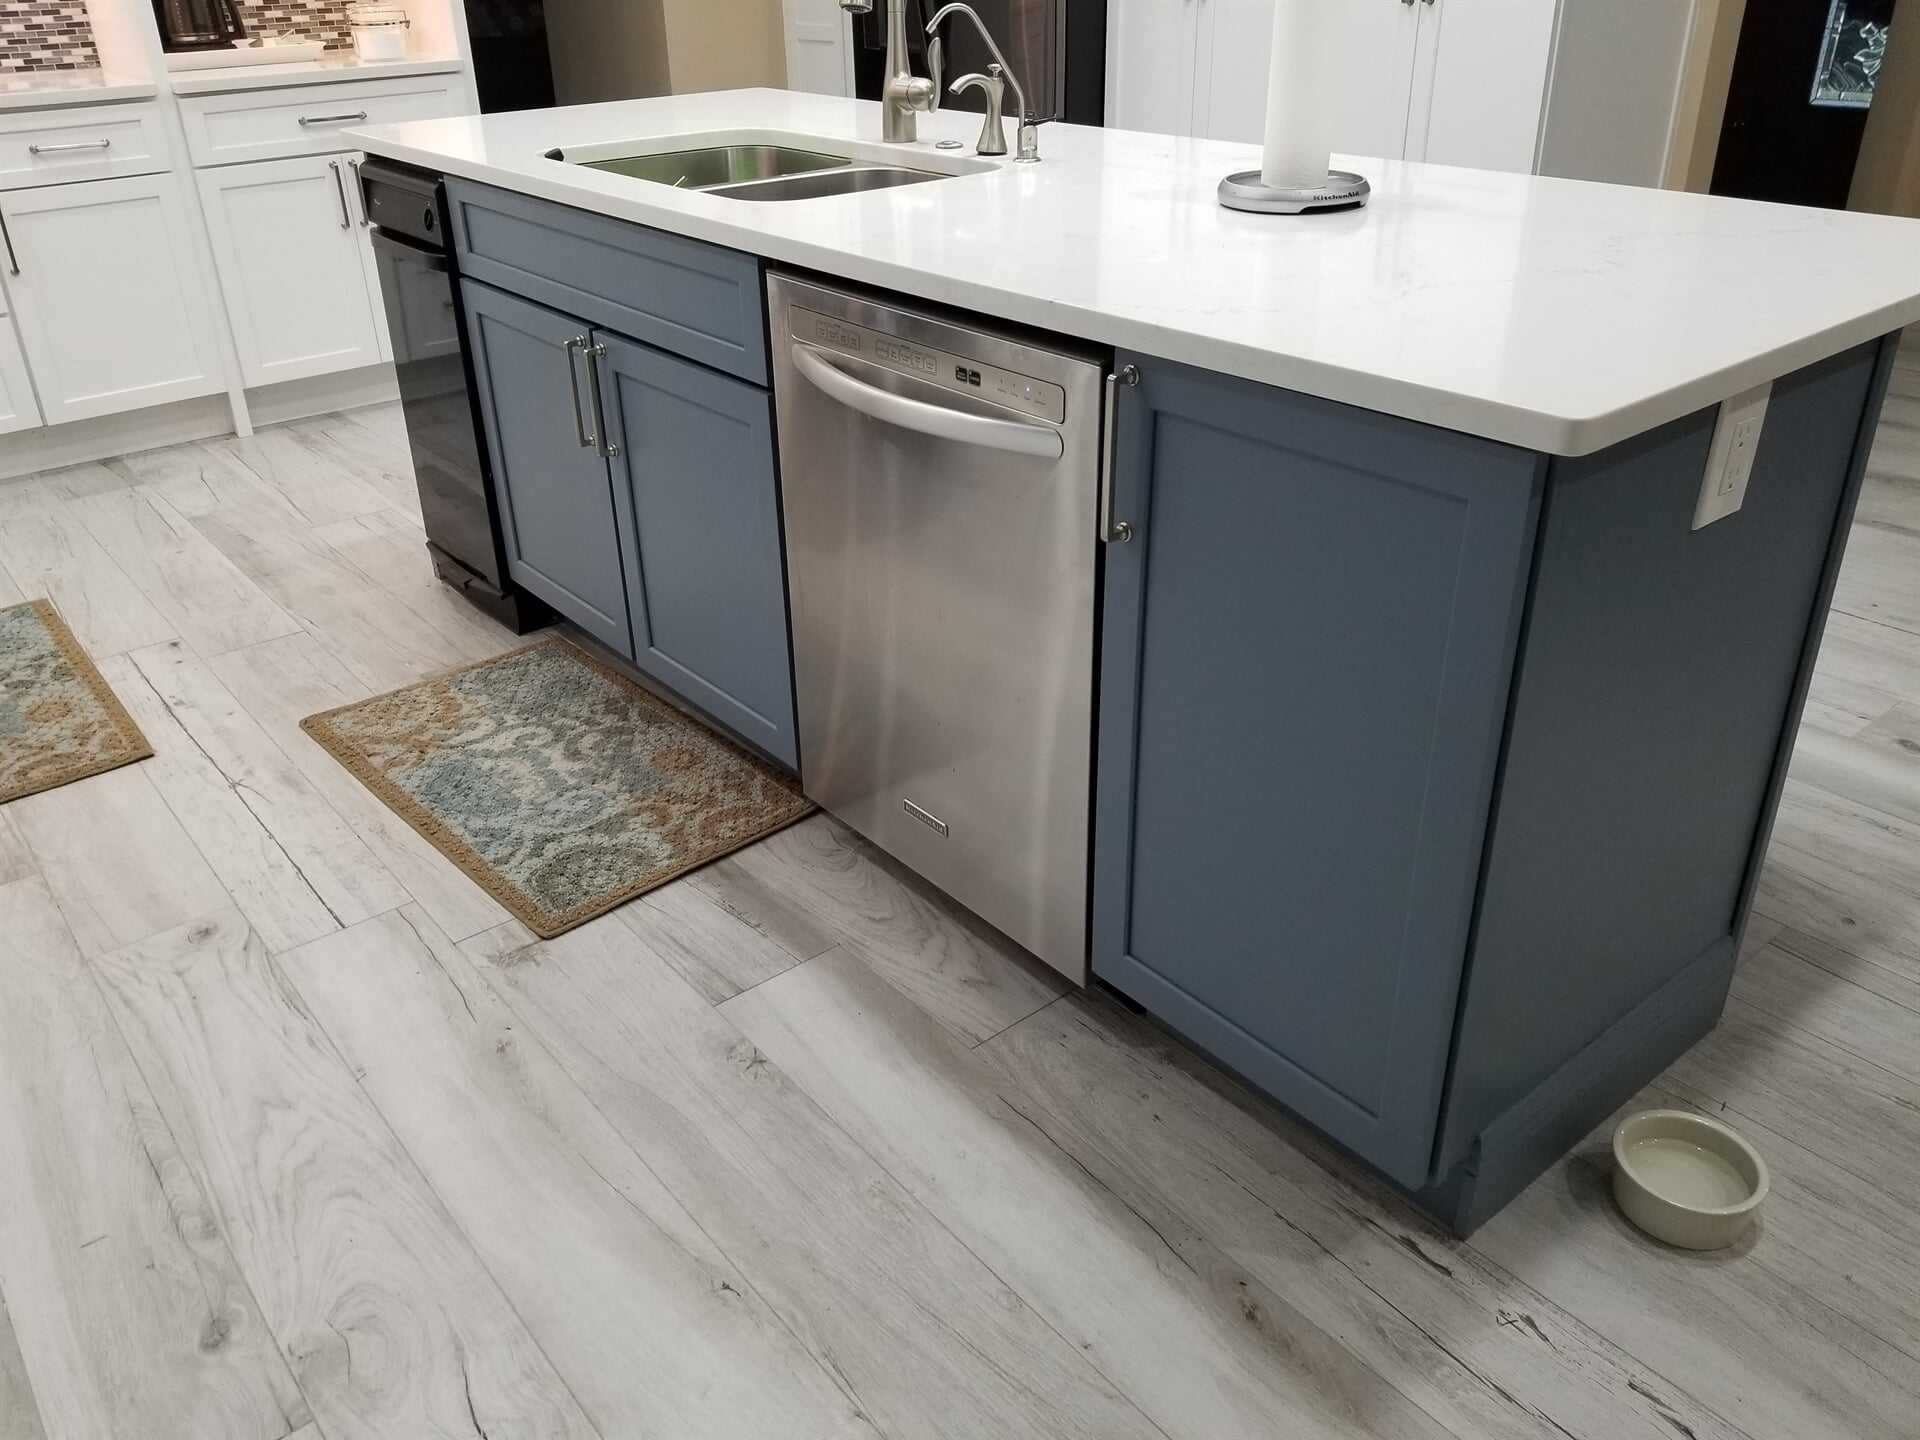 Multi color cabinetry in Stuart, FL from Agler Kitchen, Bath & Floors